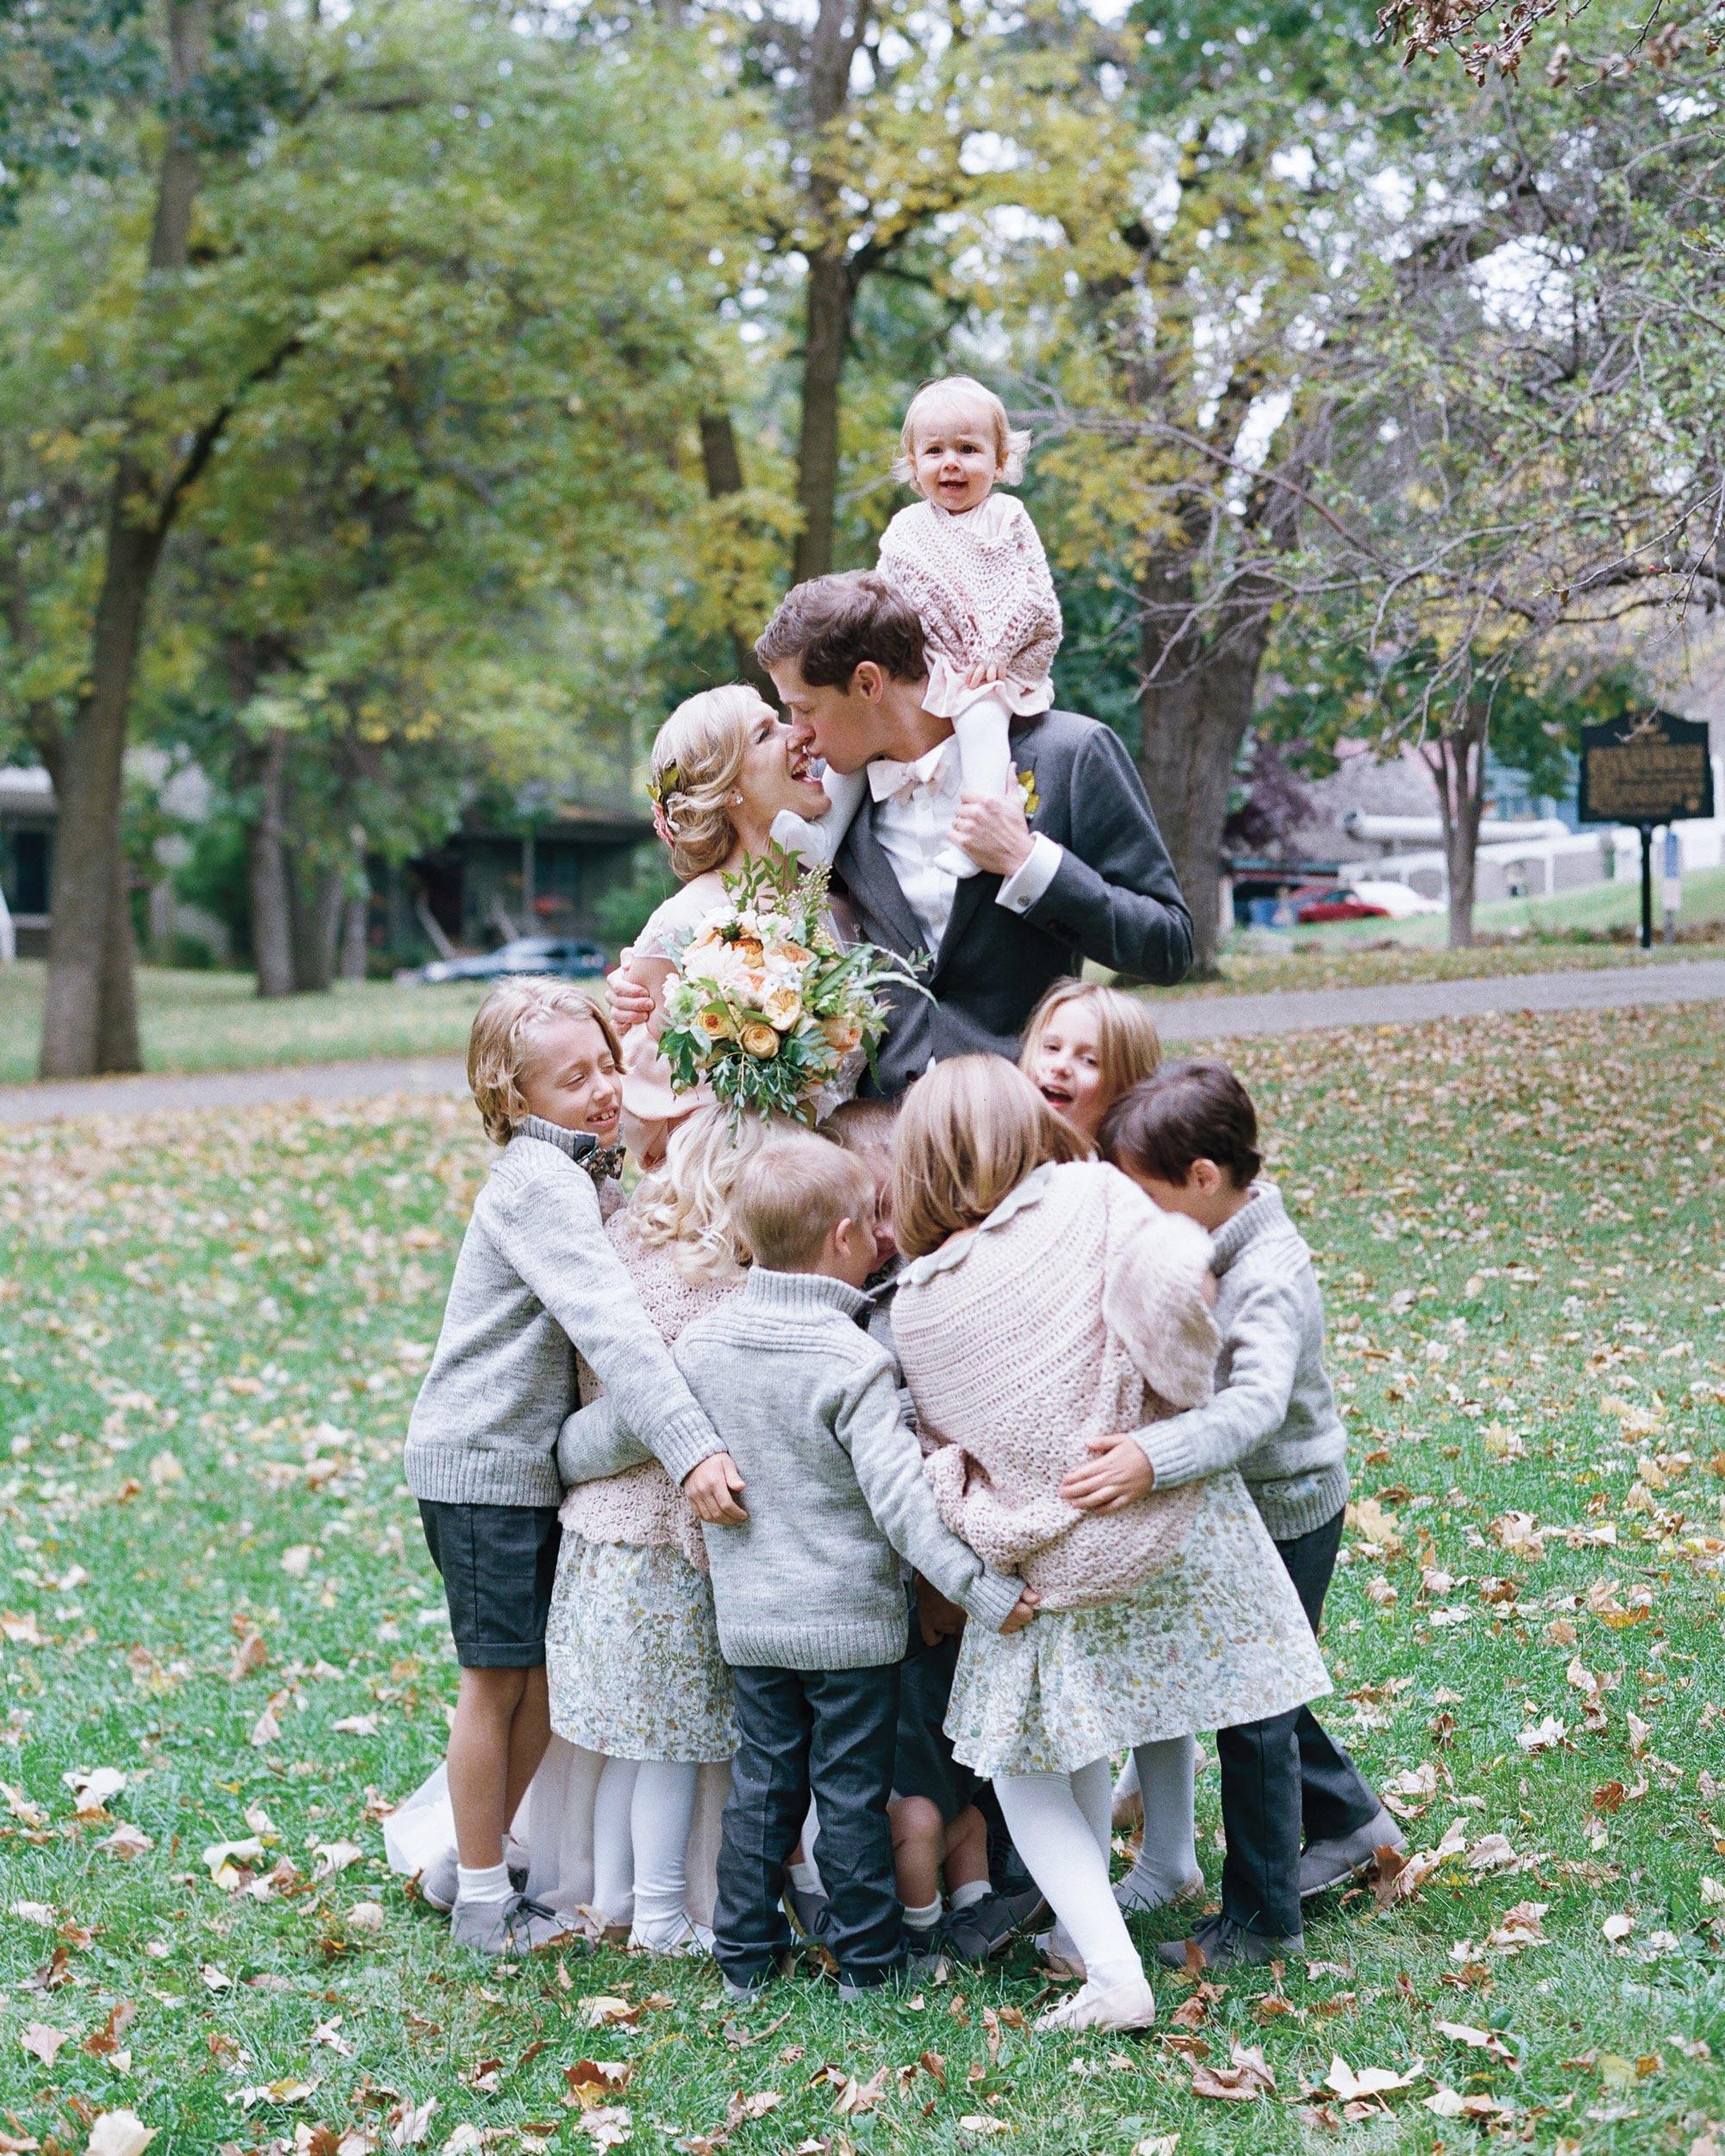 adrienne-jason-real-wedding-kids-group-hug-couple.jpg